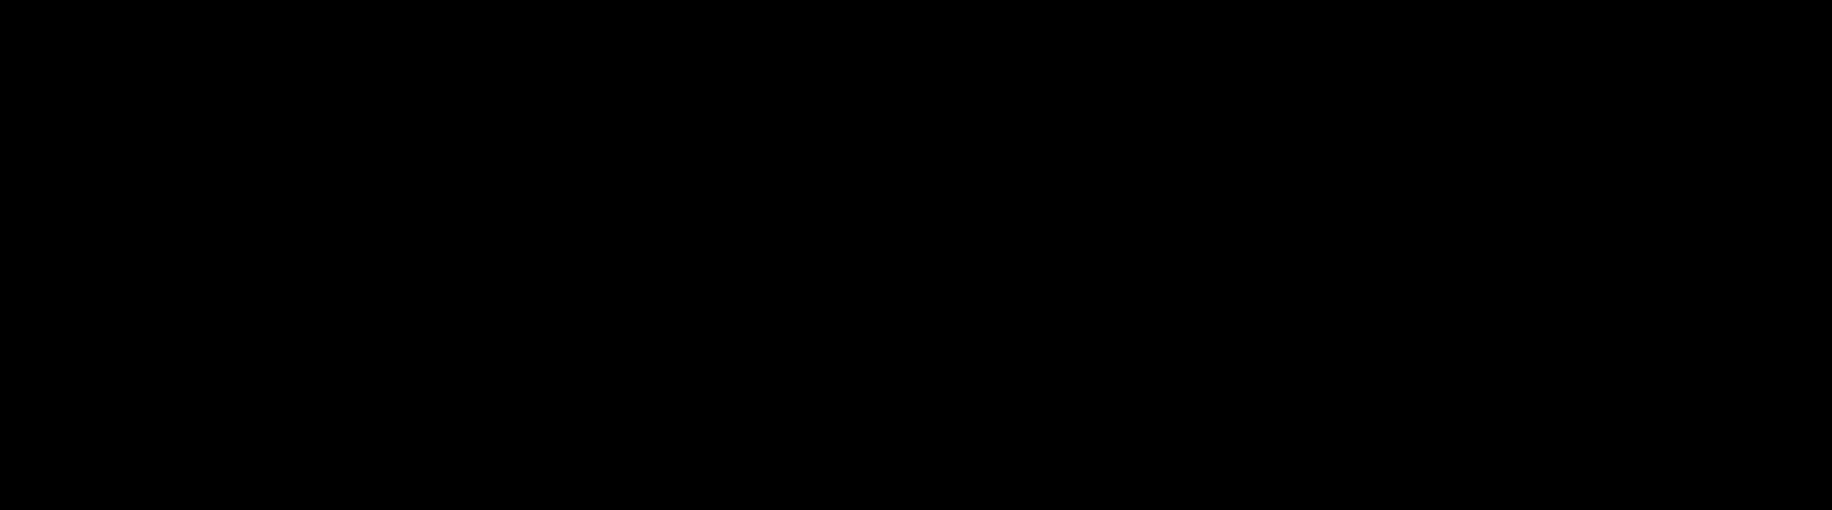 Hexyl-β-D-glucopyranoside